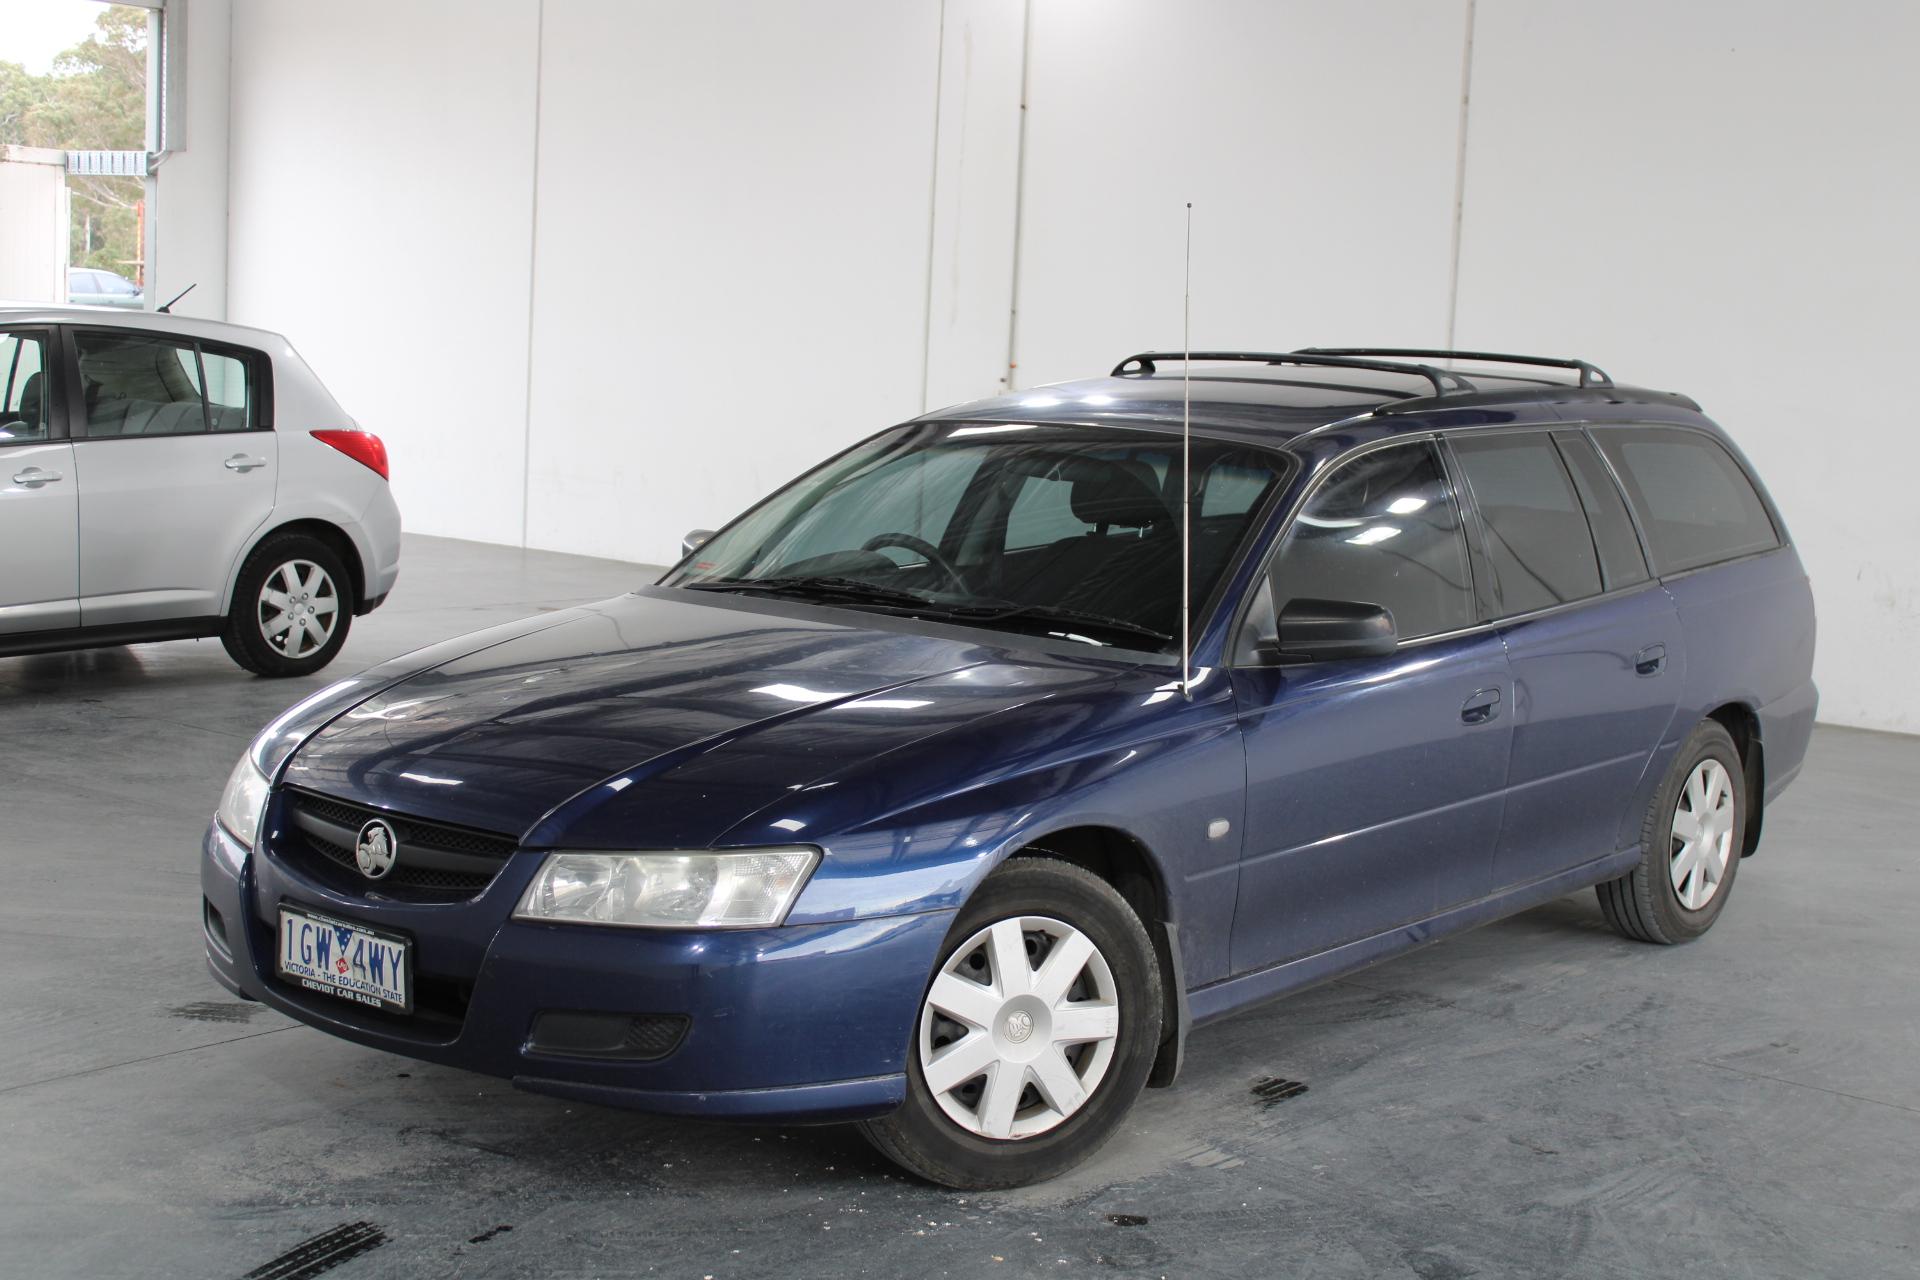 2006 Holden Commodore Lumina VZ Automatic Wagon